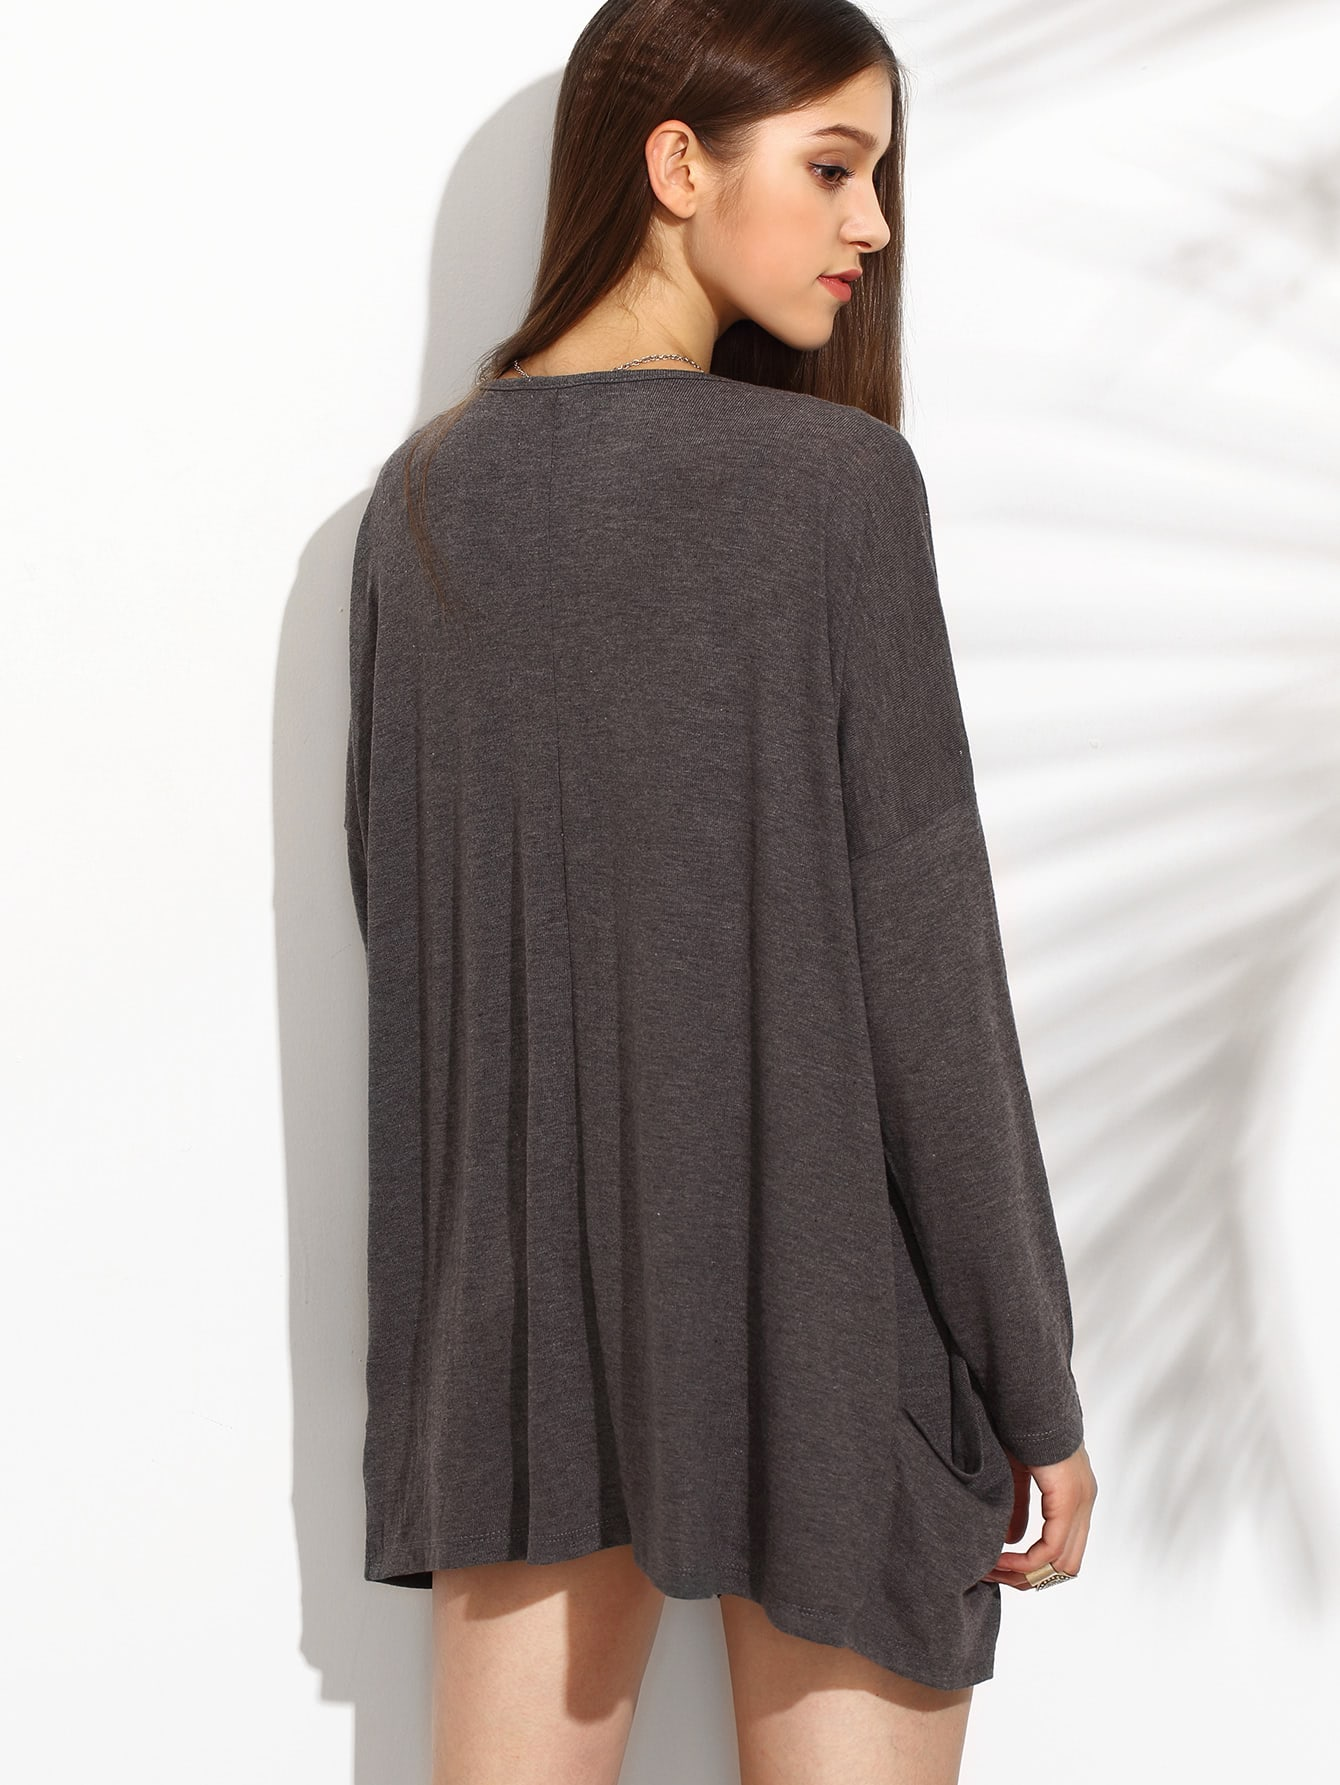 sweater160728001_2